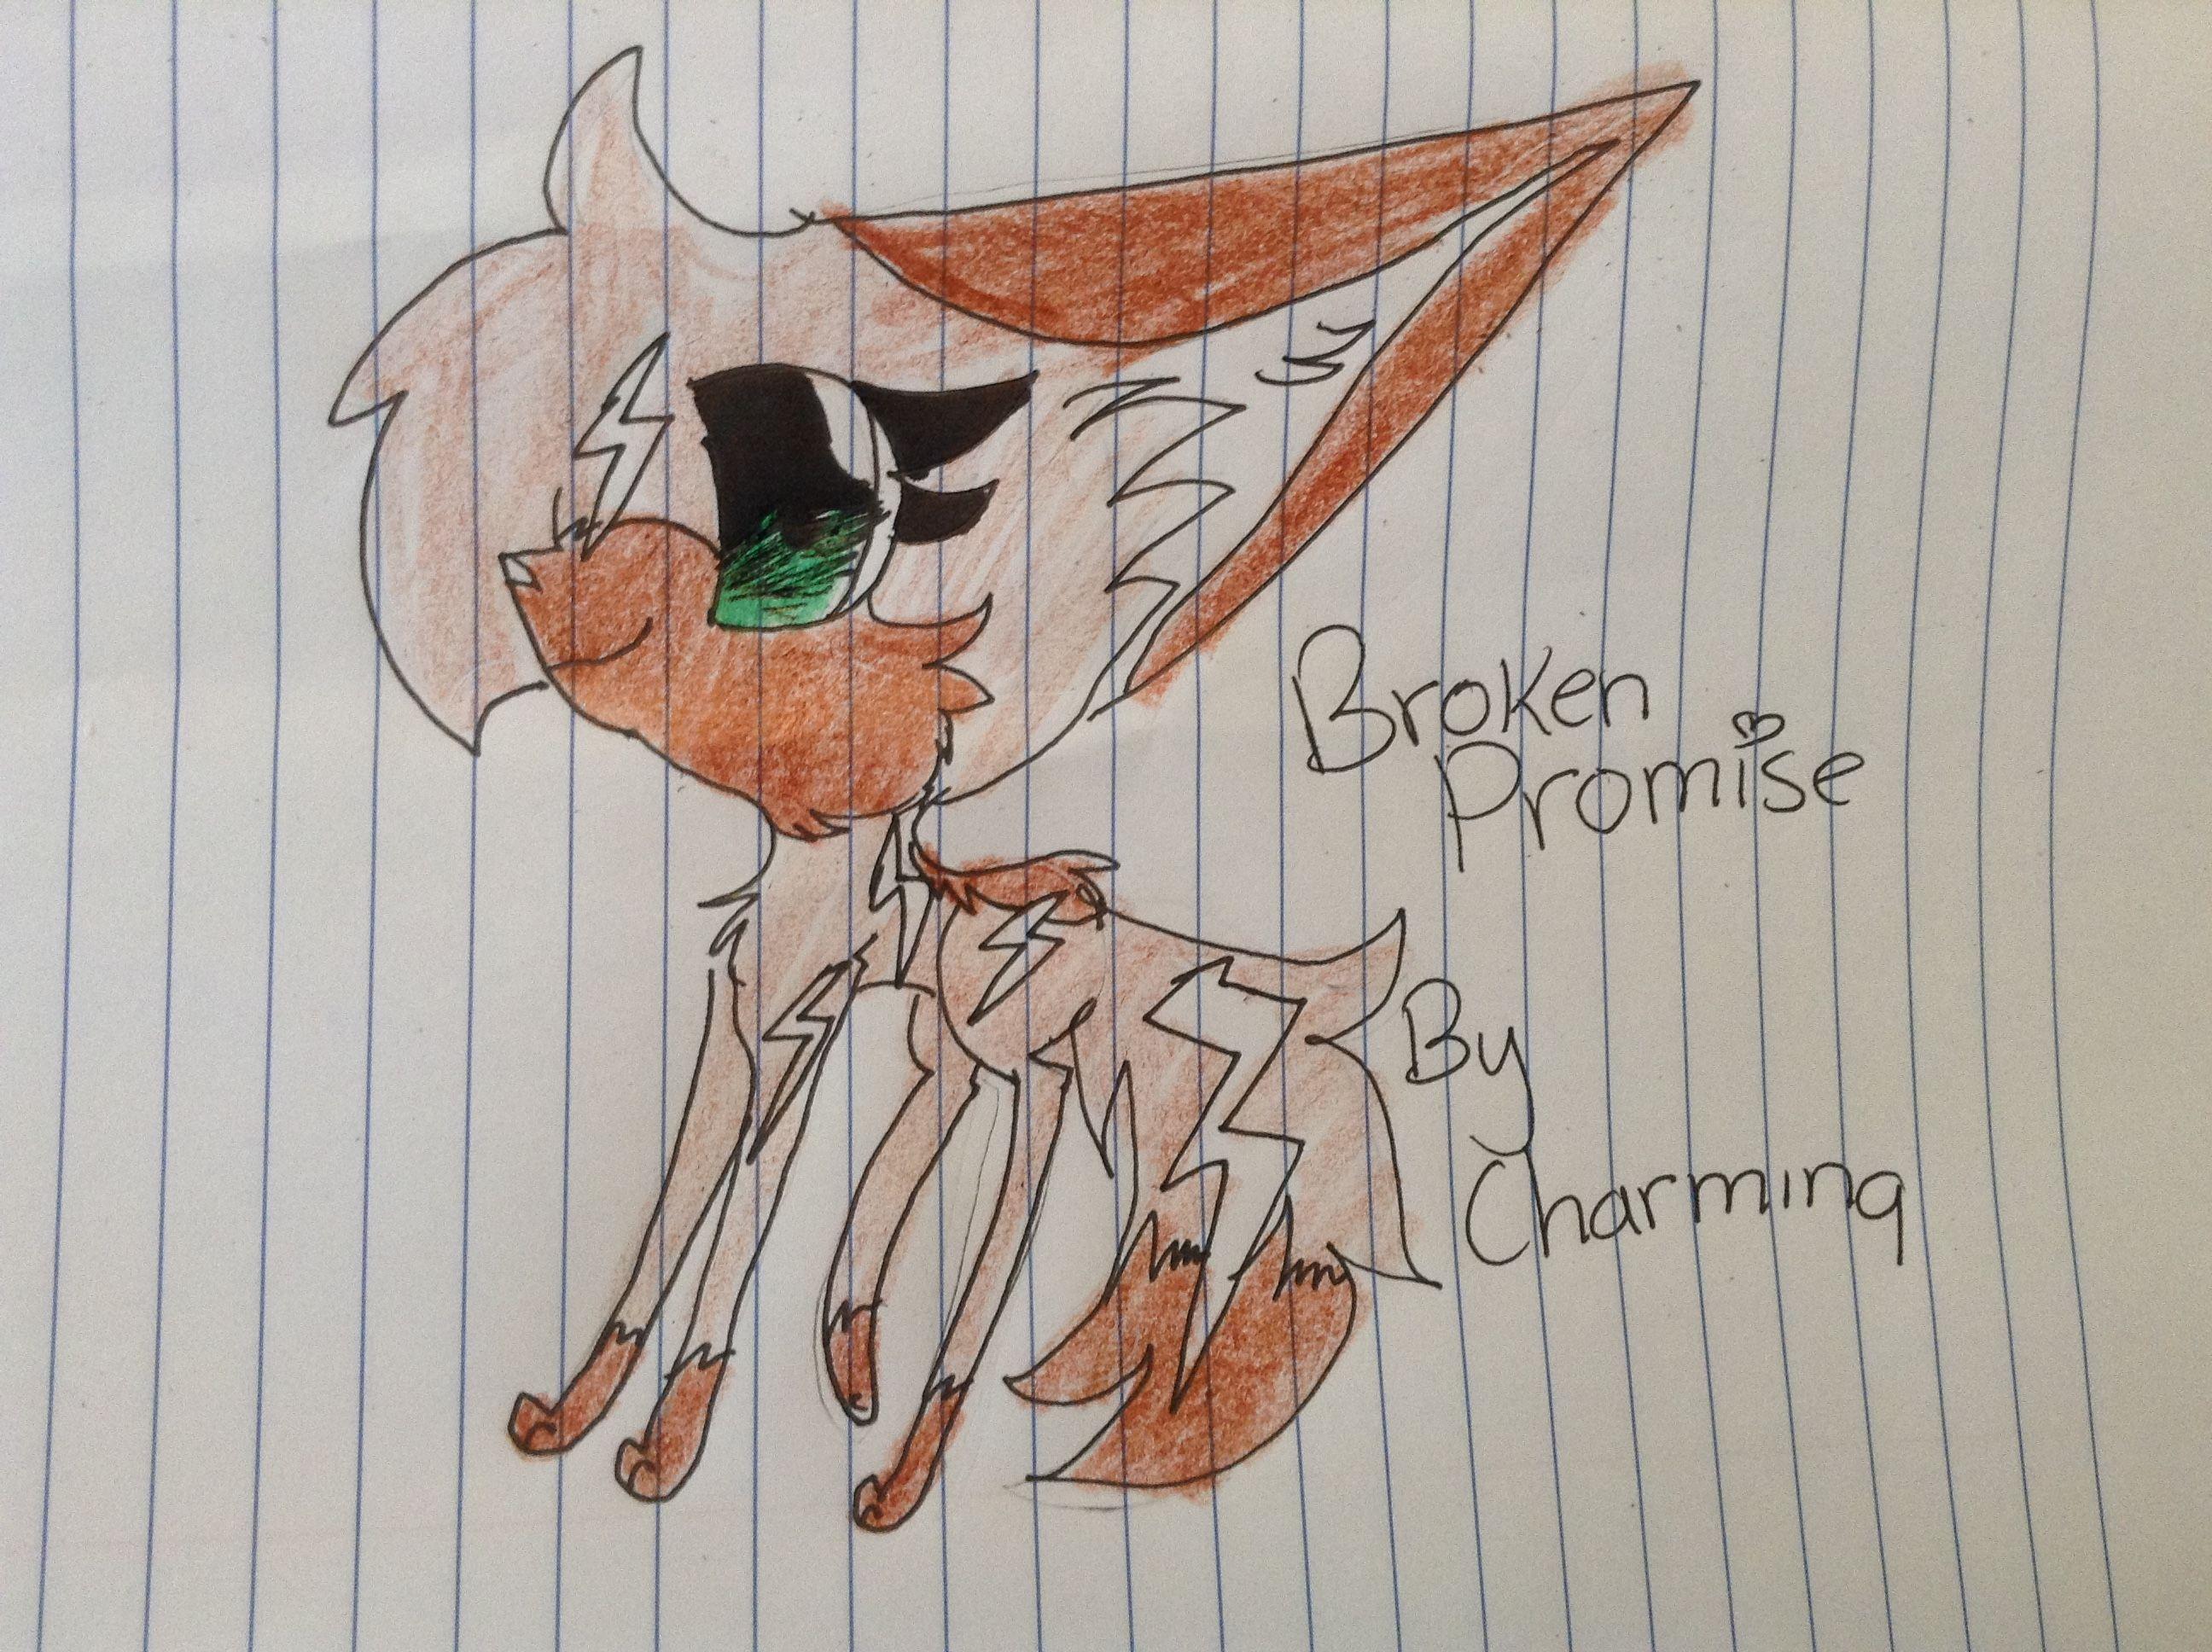 @BrokenpromiseOC